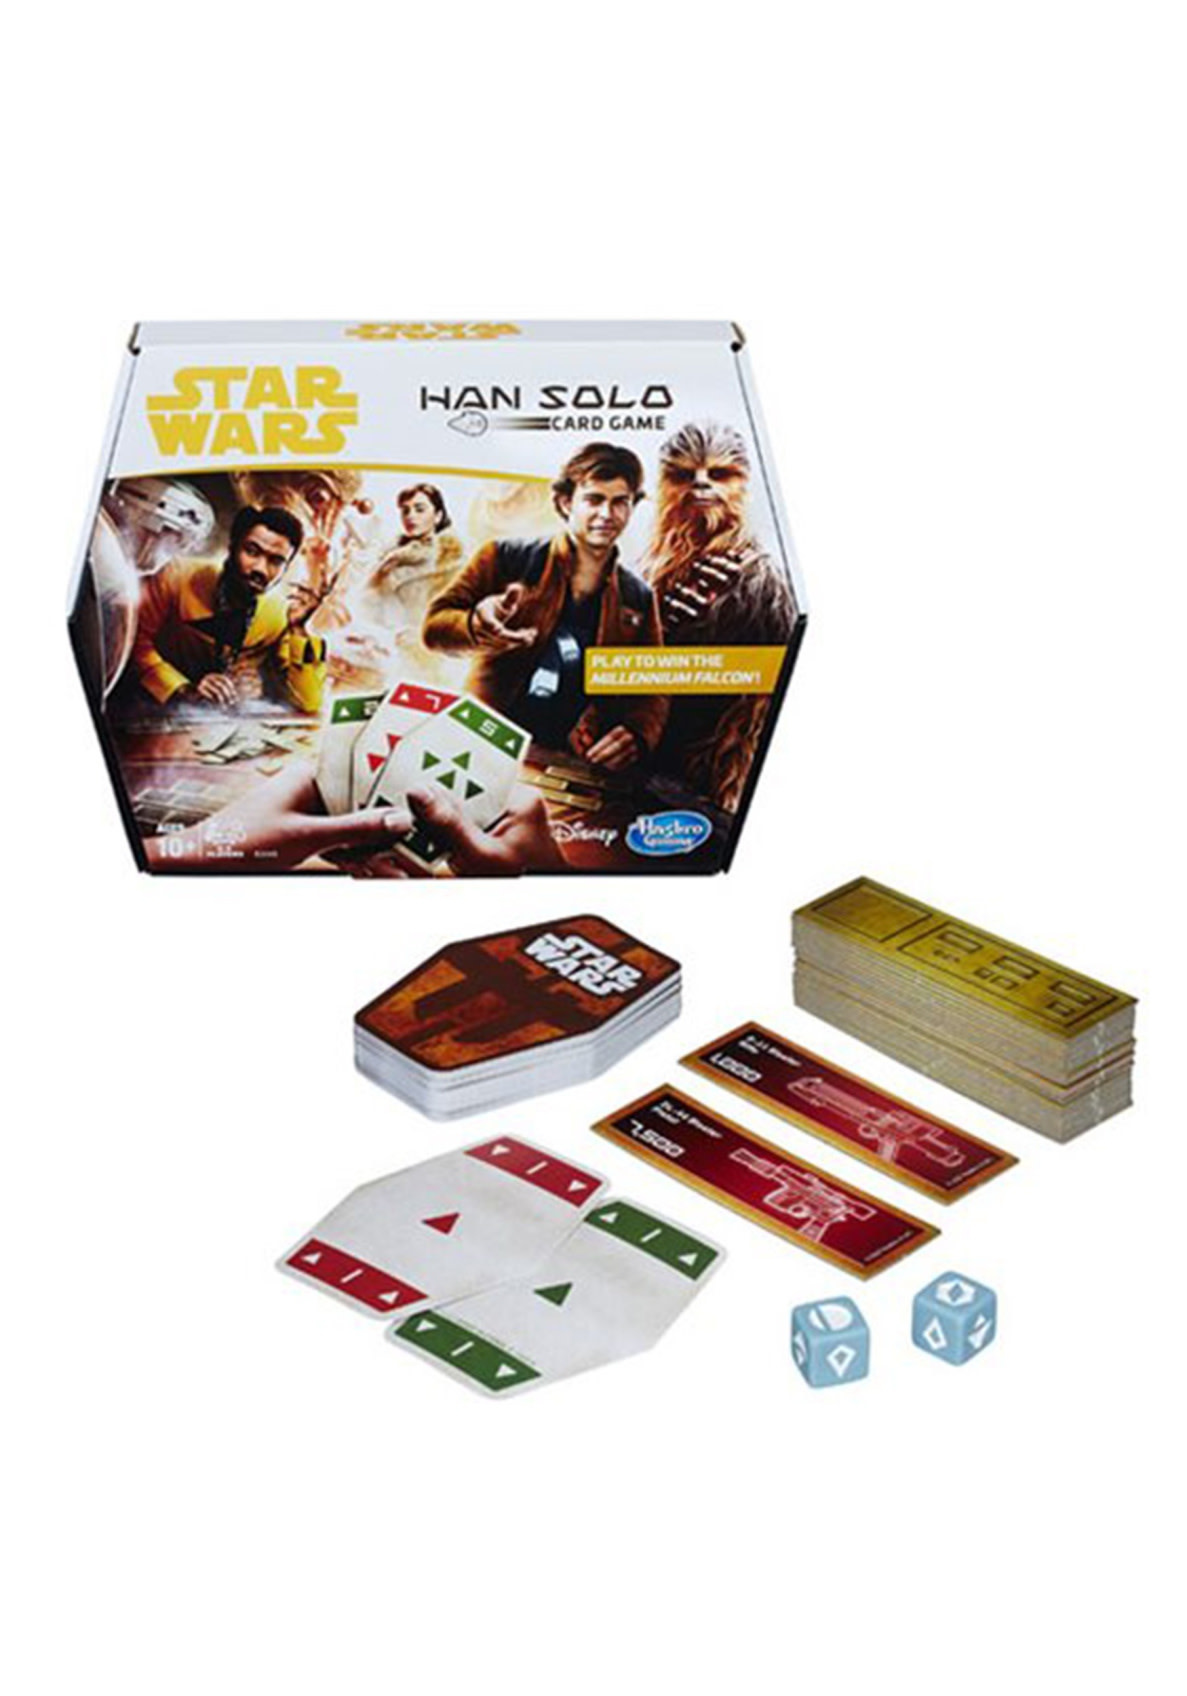 HASBRO Star Wars: Han Solo Card Game (Sabacc)